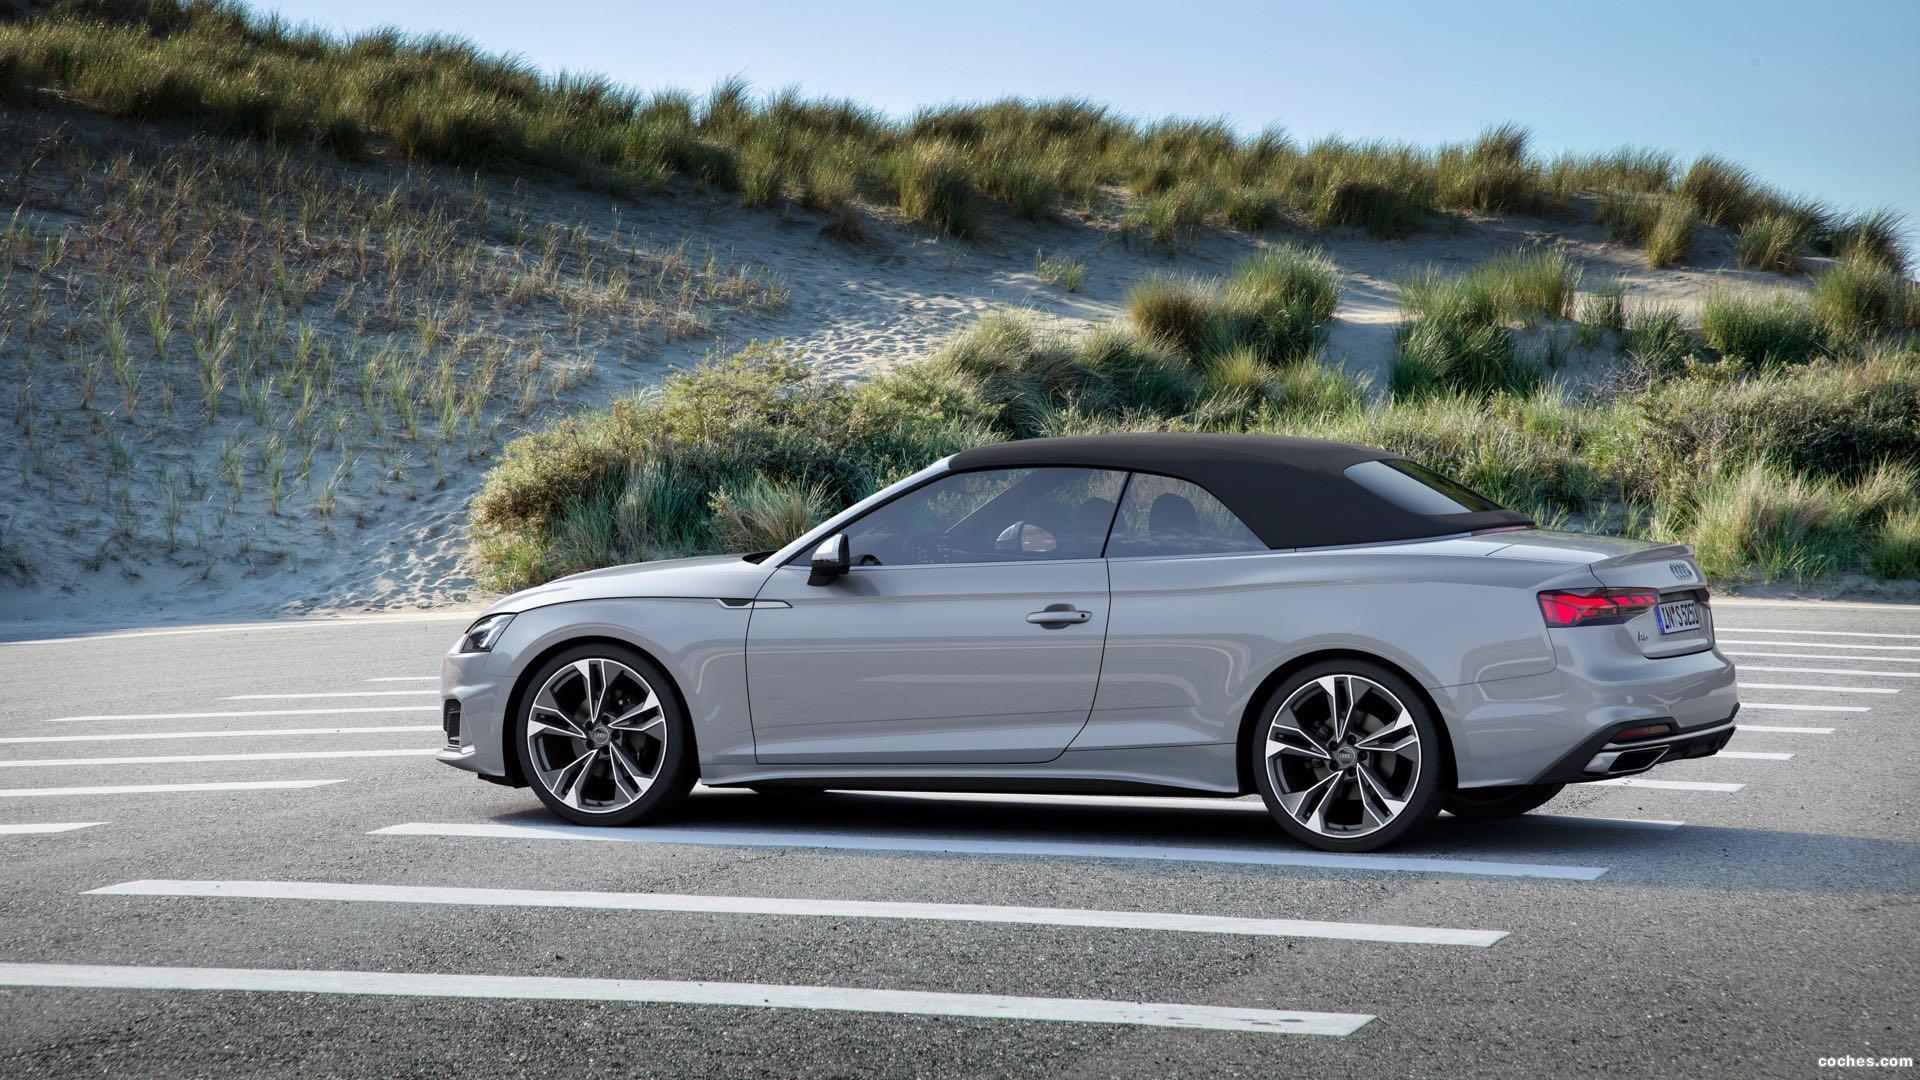 Foto 0 de Audi A5 Cabrio 40 TFSI 2019